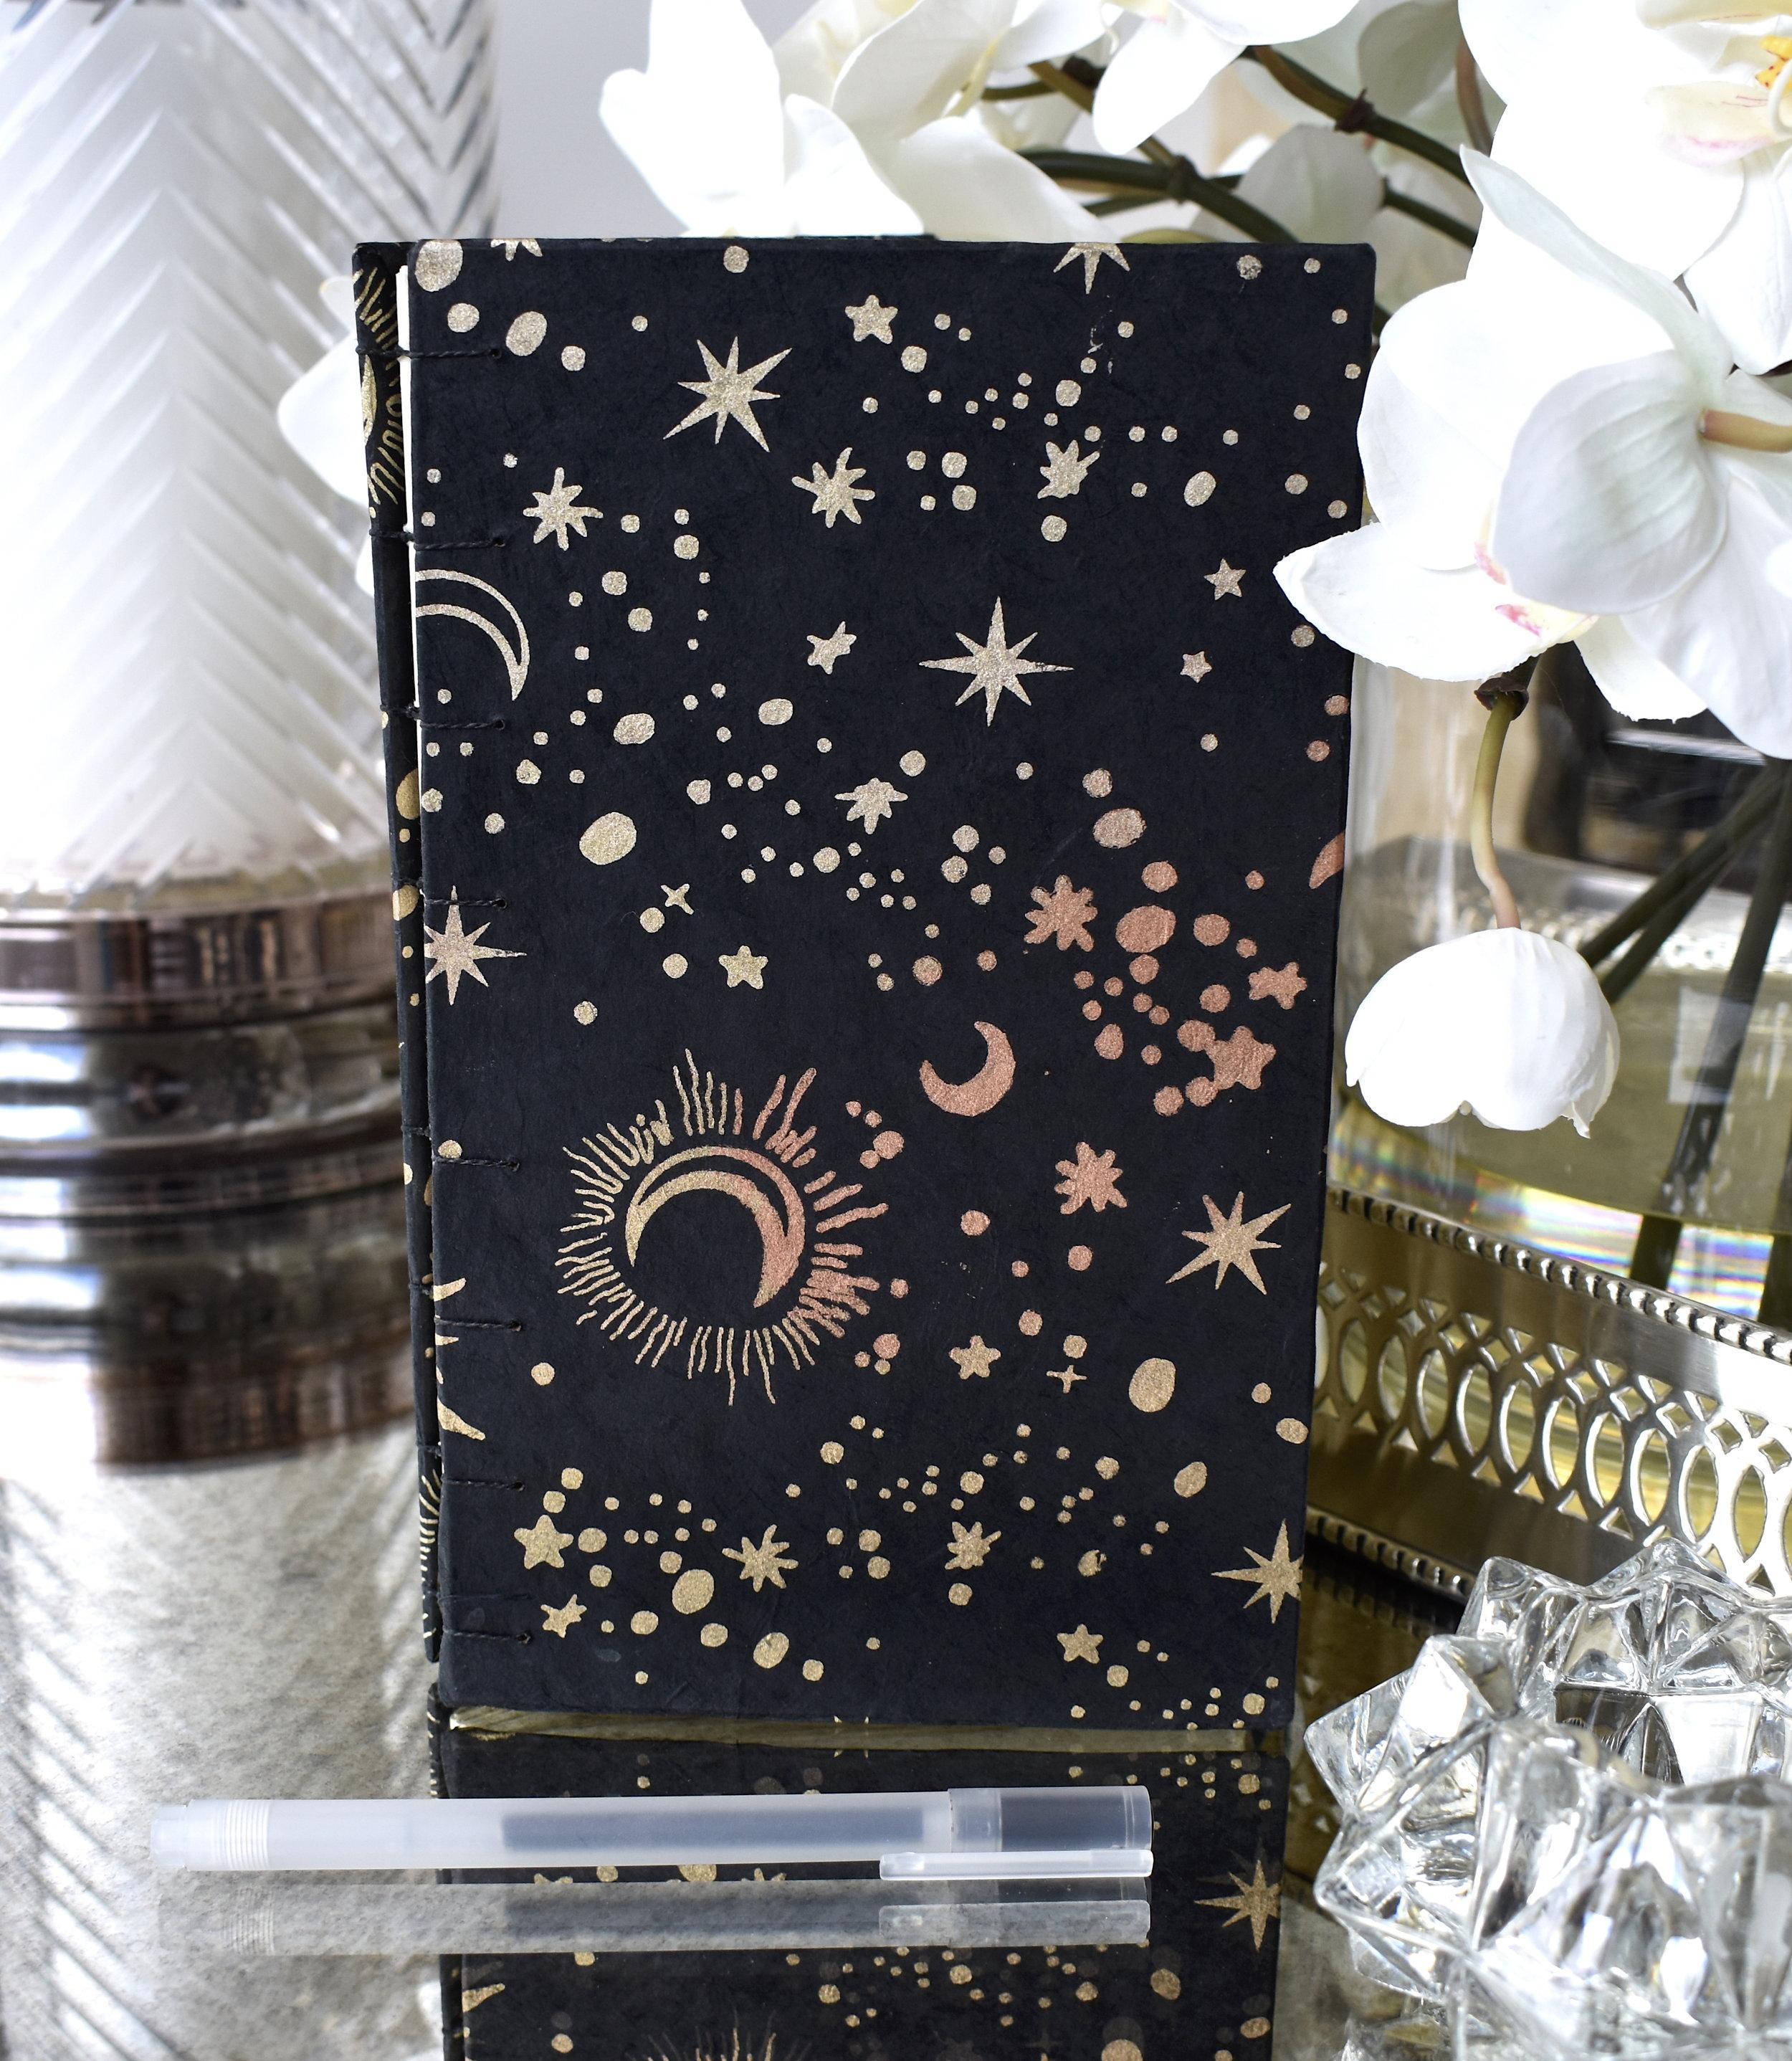 """Galaxy book"" 2019  8.5x5 inches"